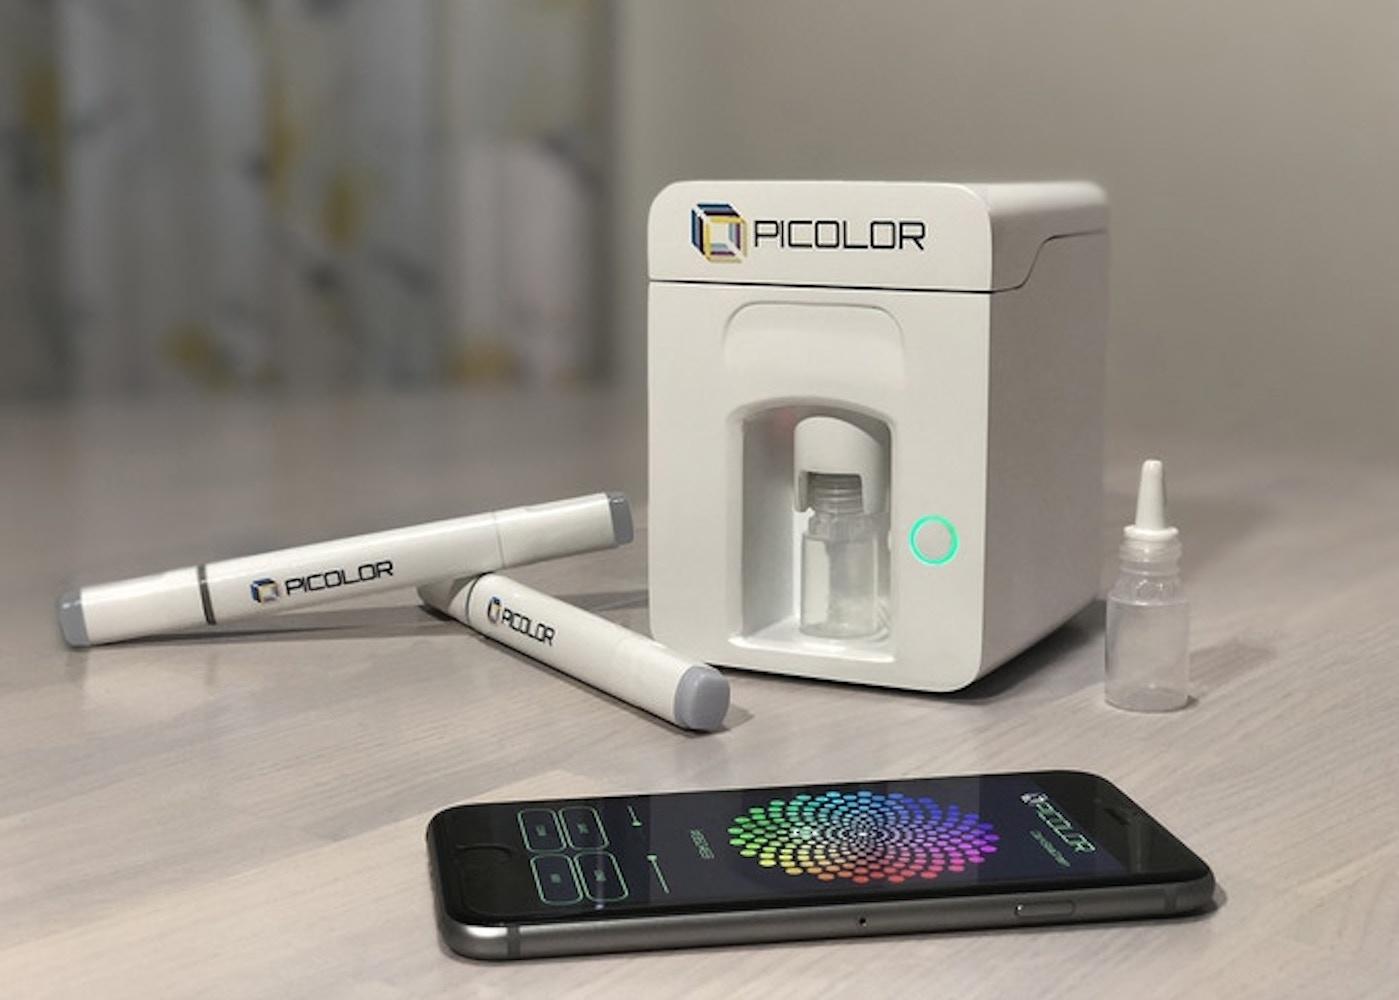 Picolor Paint Mixing Device